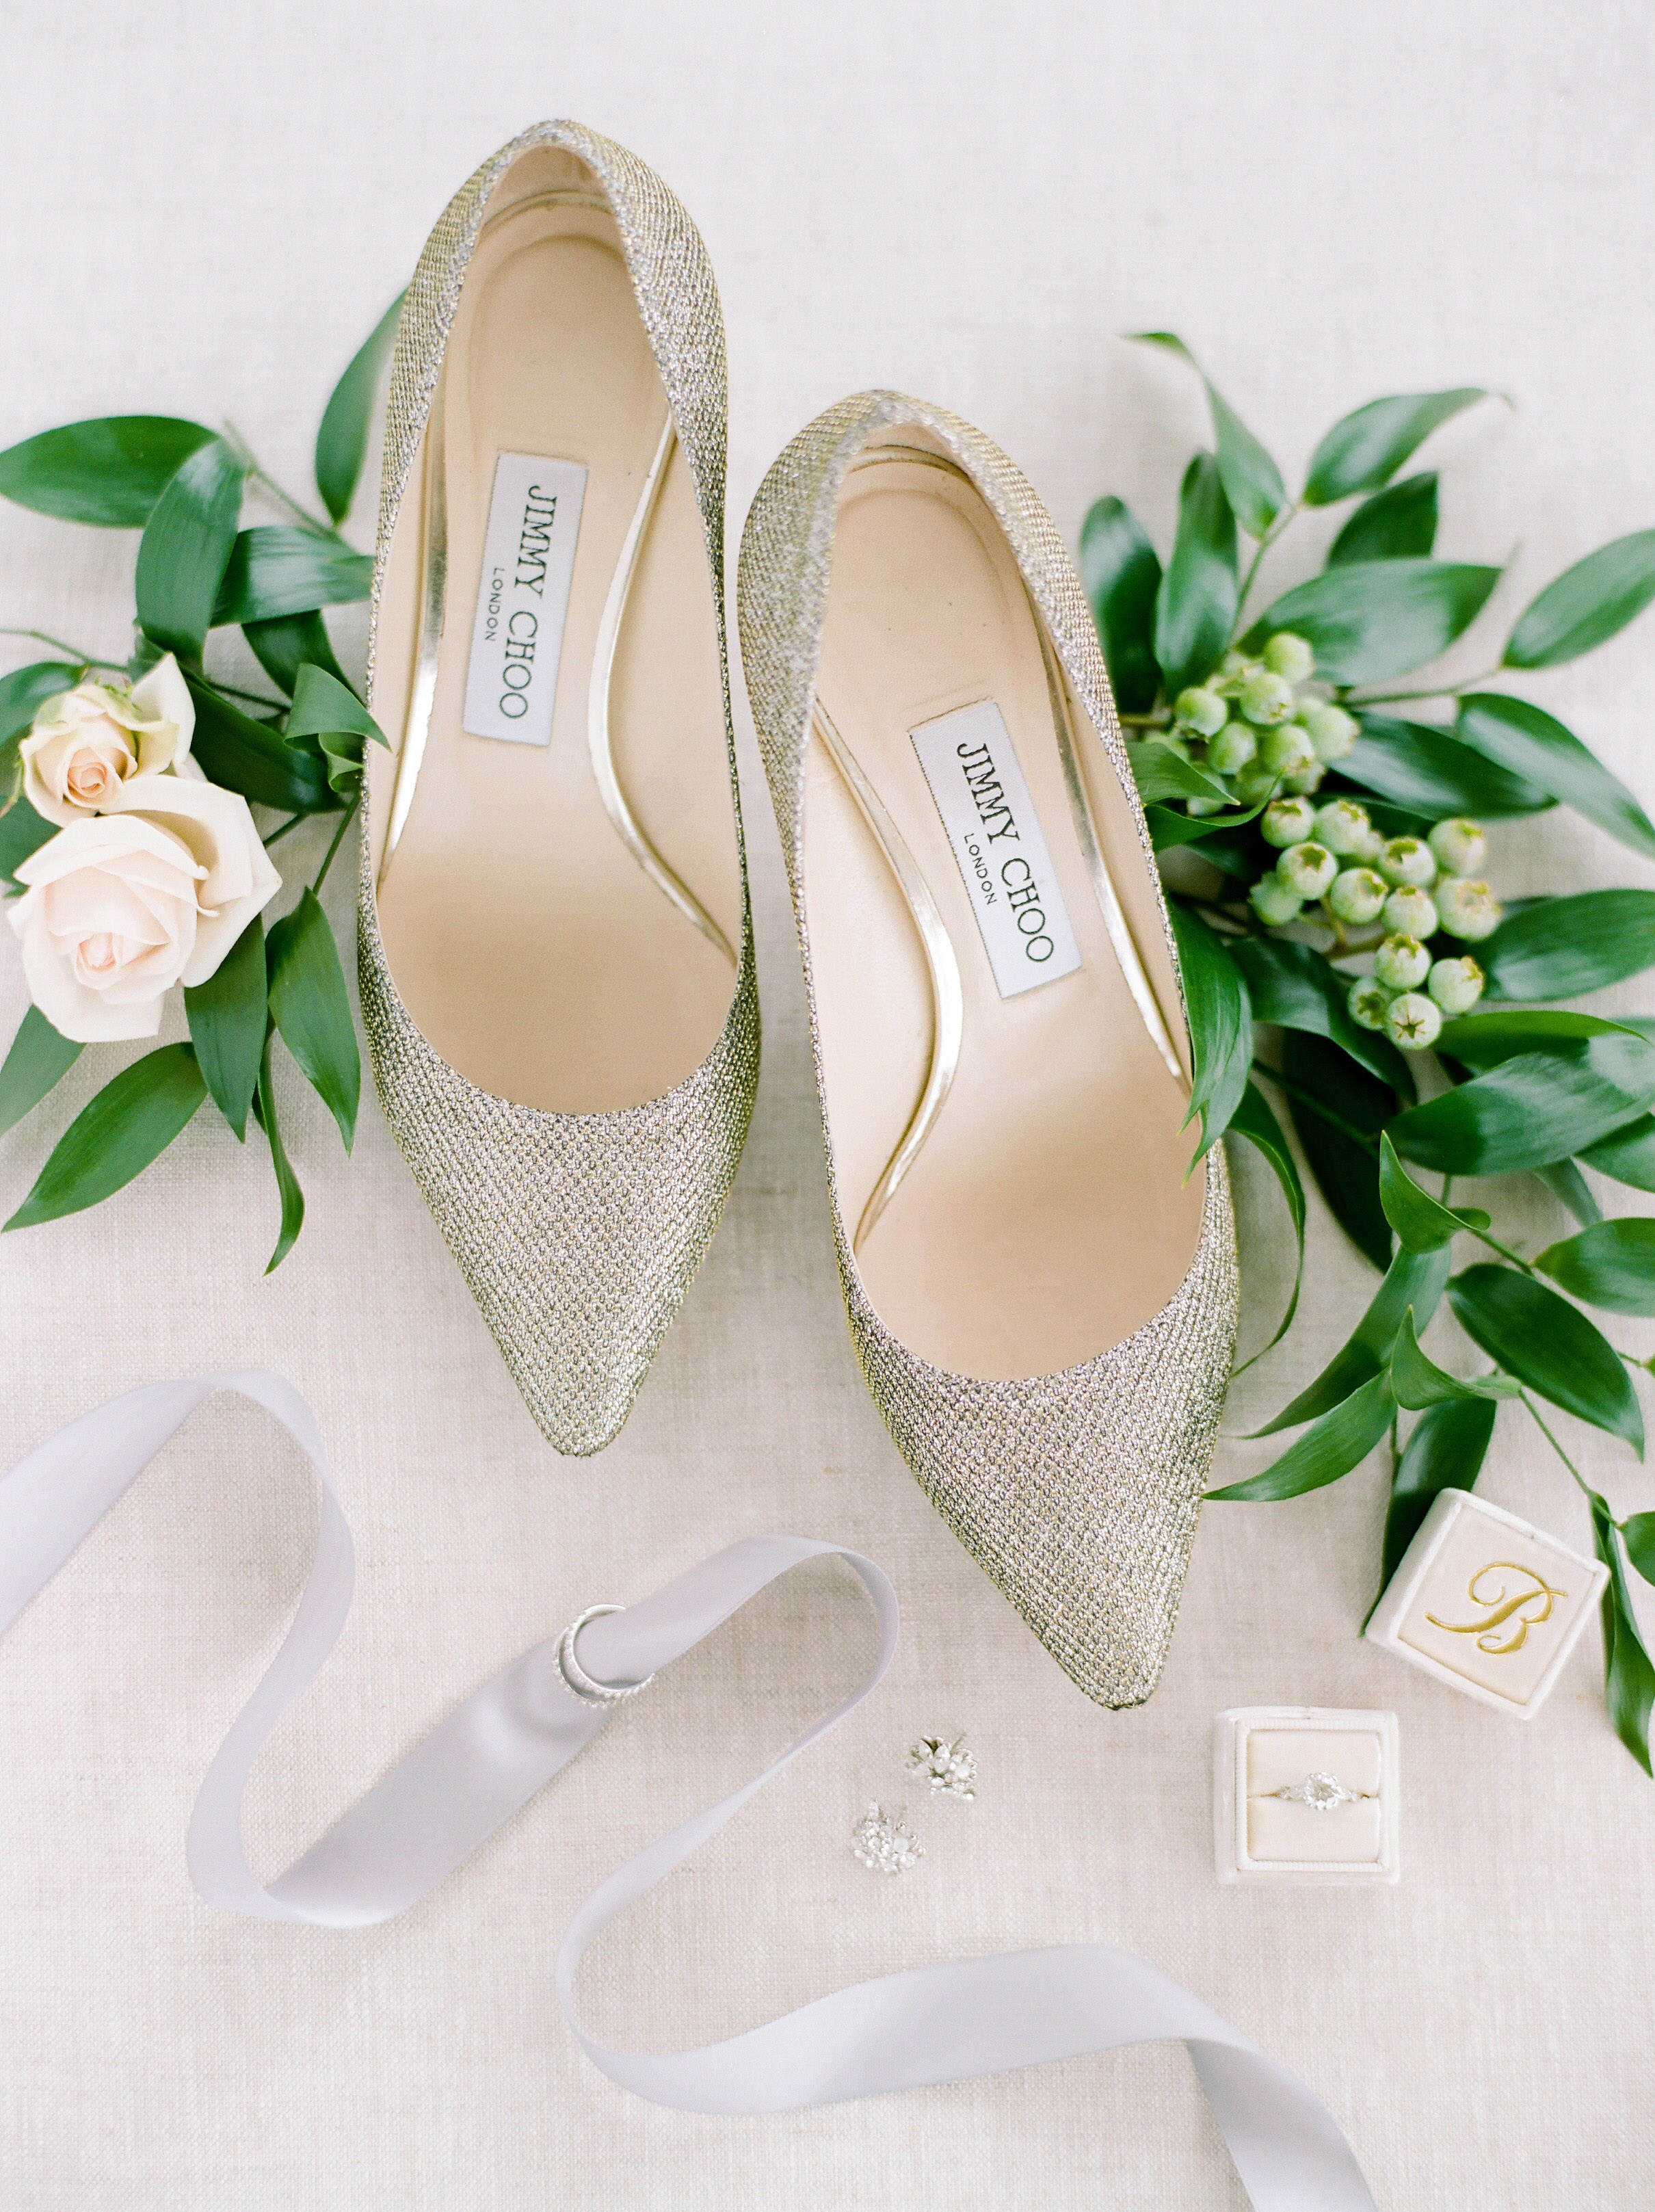 Fine-Art-Film-Houston-Wedding-Photographer-Best-Top-Luxury-Texas-Austin-Dallas-Destination-Dana-Fernandez-Photography-River-Oaks-Country-Club-South-Main-Baptist-Ceremony-Reception-Wedding-2.jpg